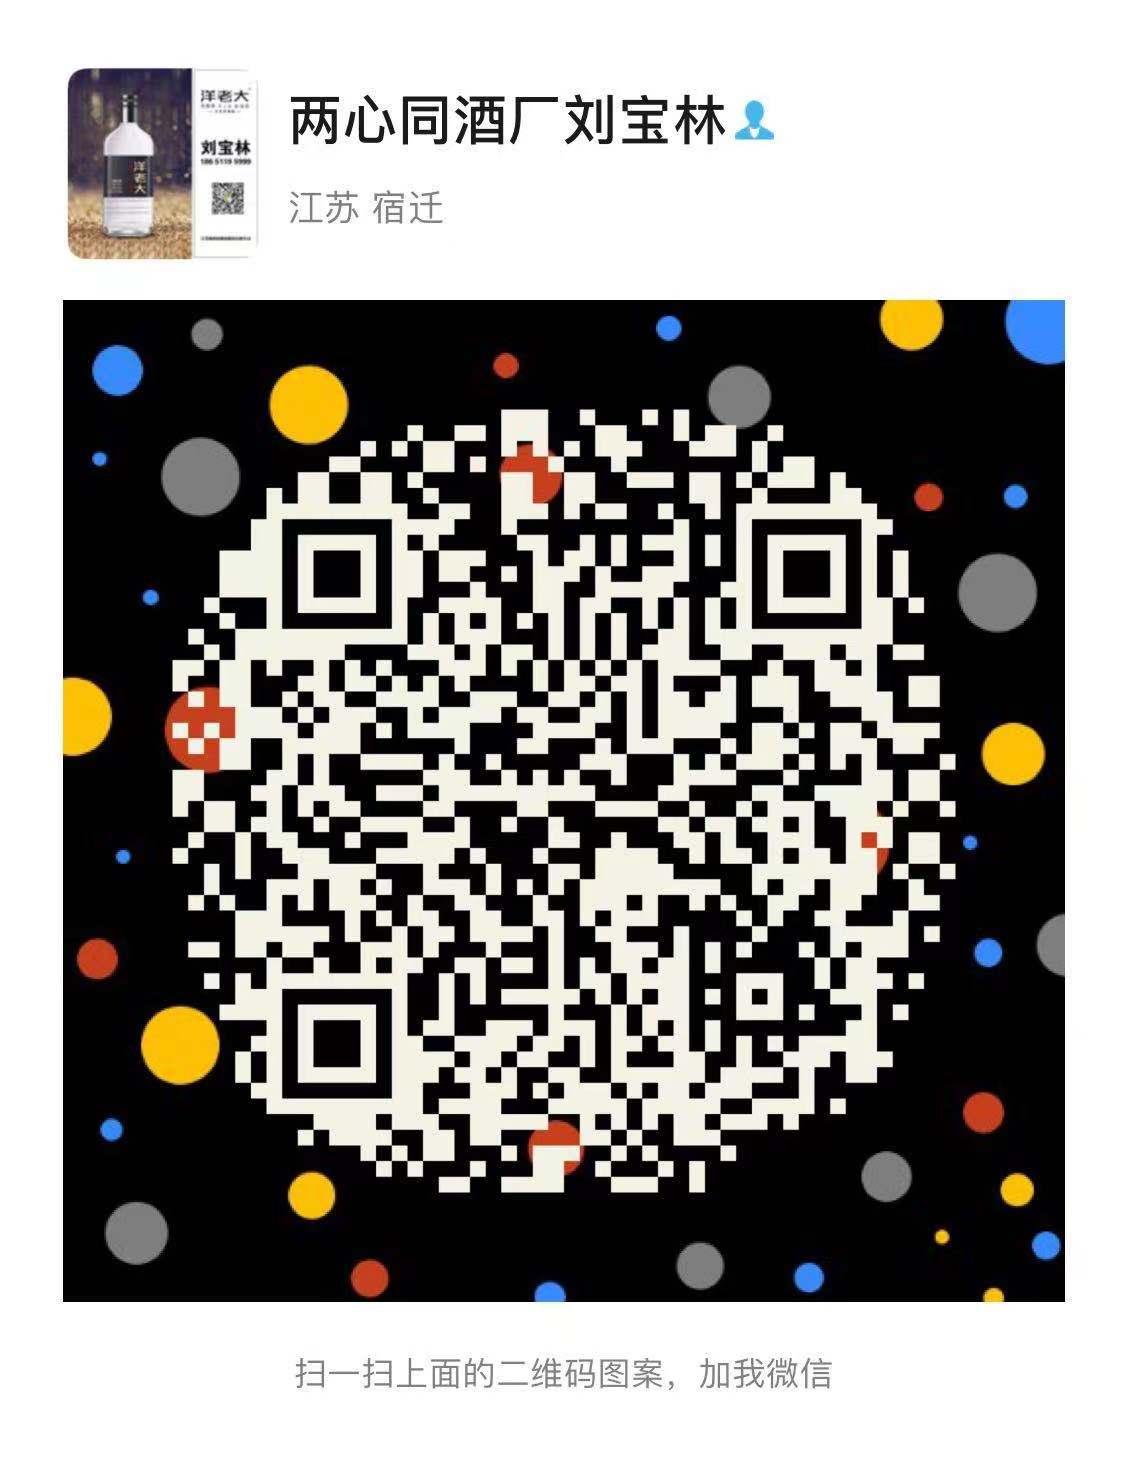 �F州�F�e宴酒�I有限公司官方微信